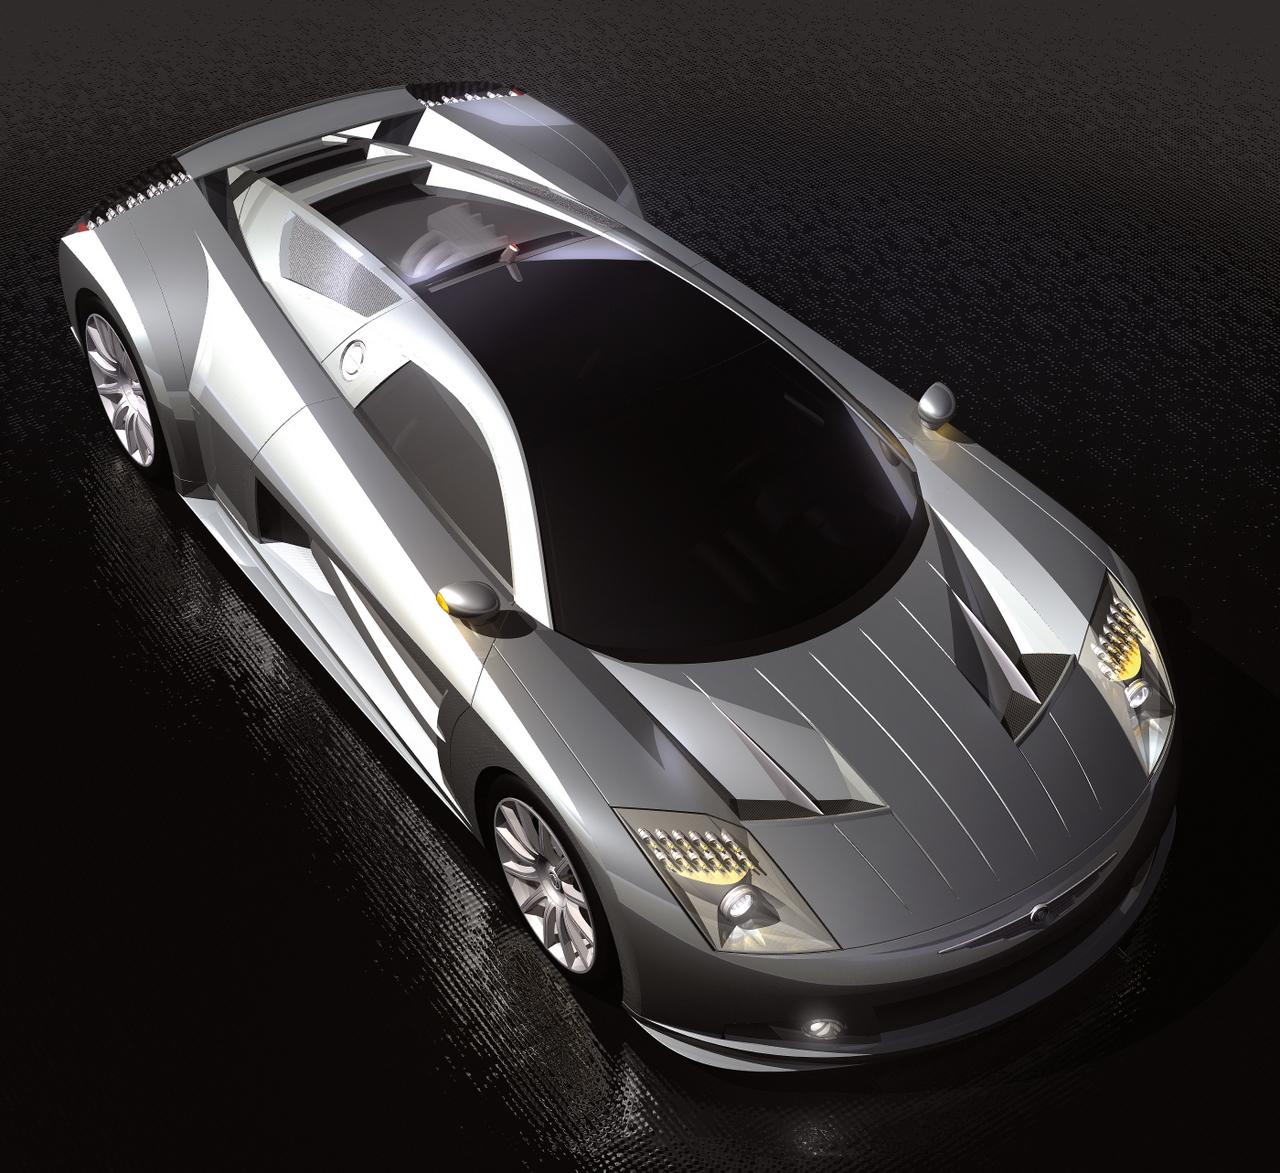 Chrysler mefour twelve